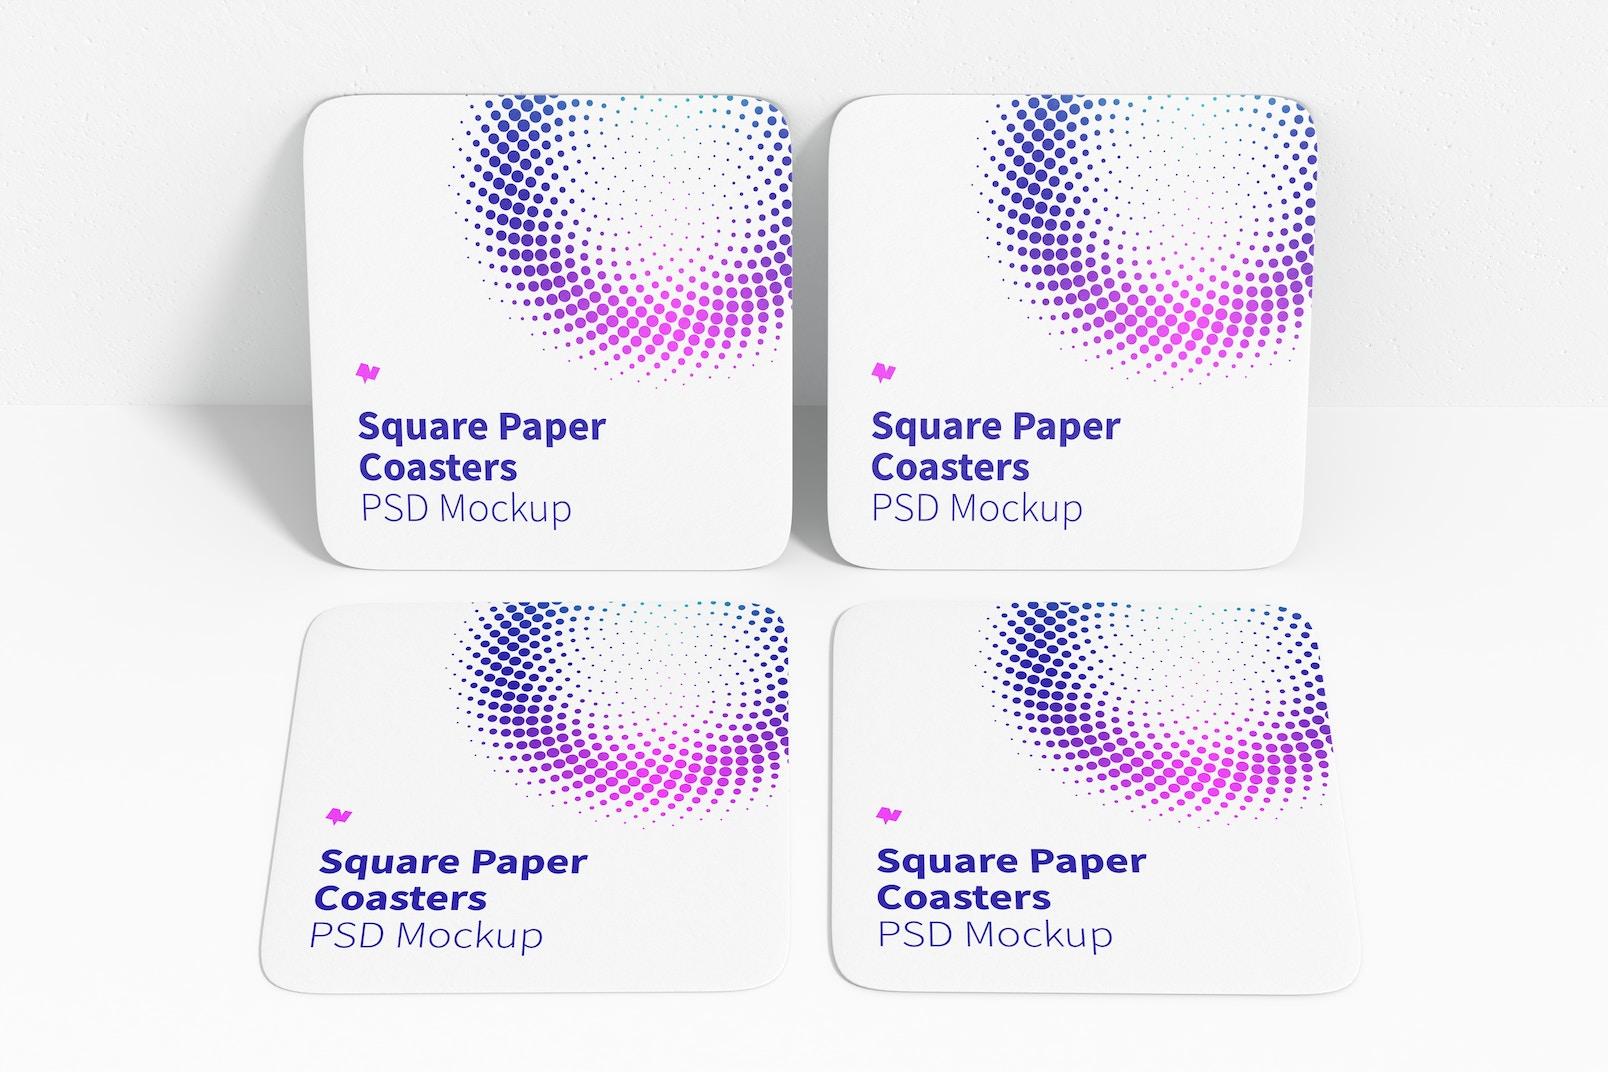 Square Paper Coasters Mockup, Leaned